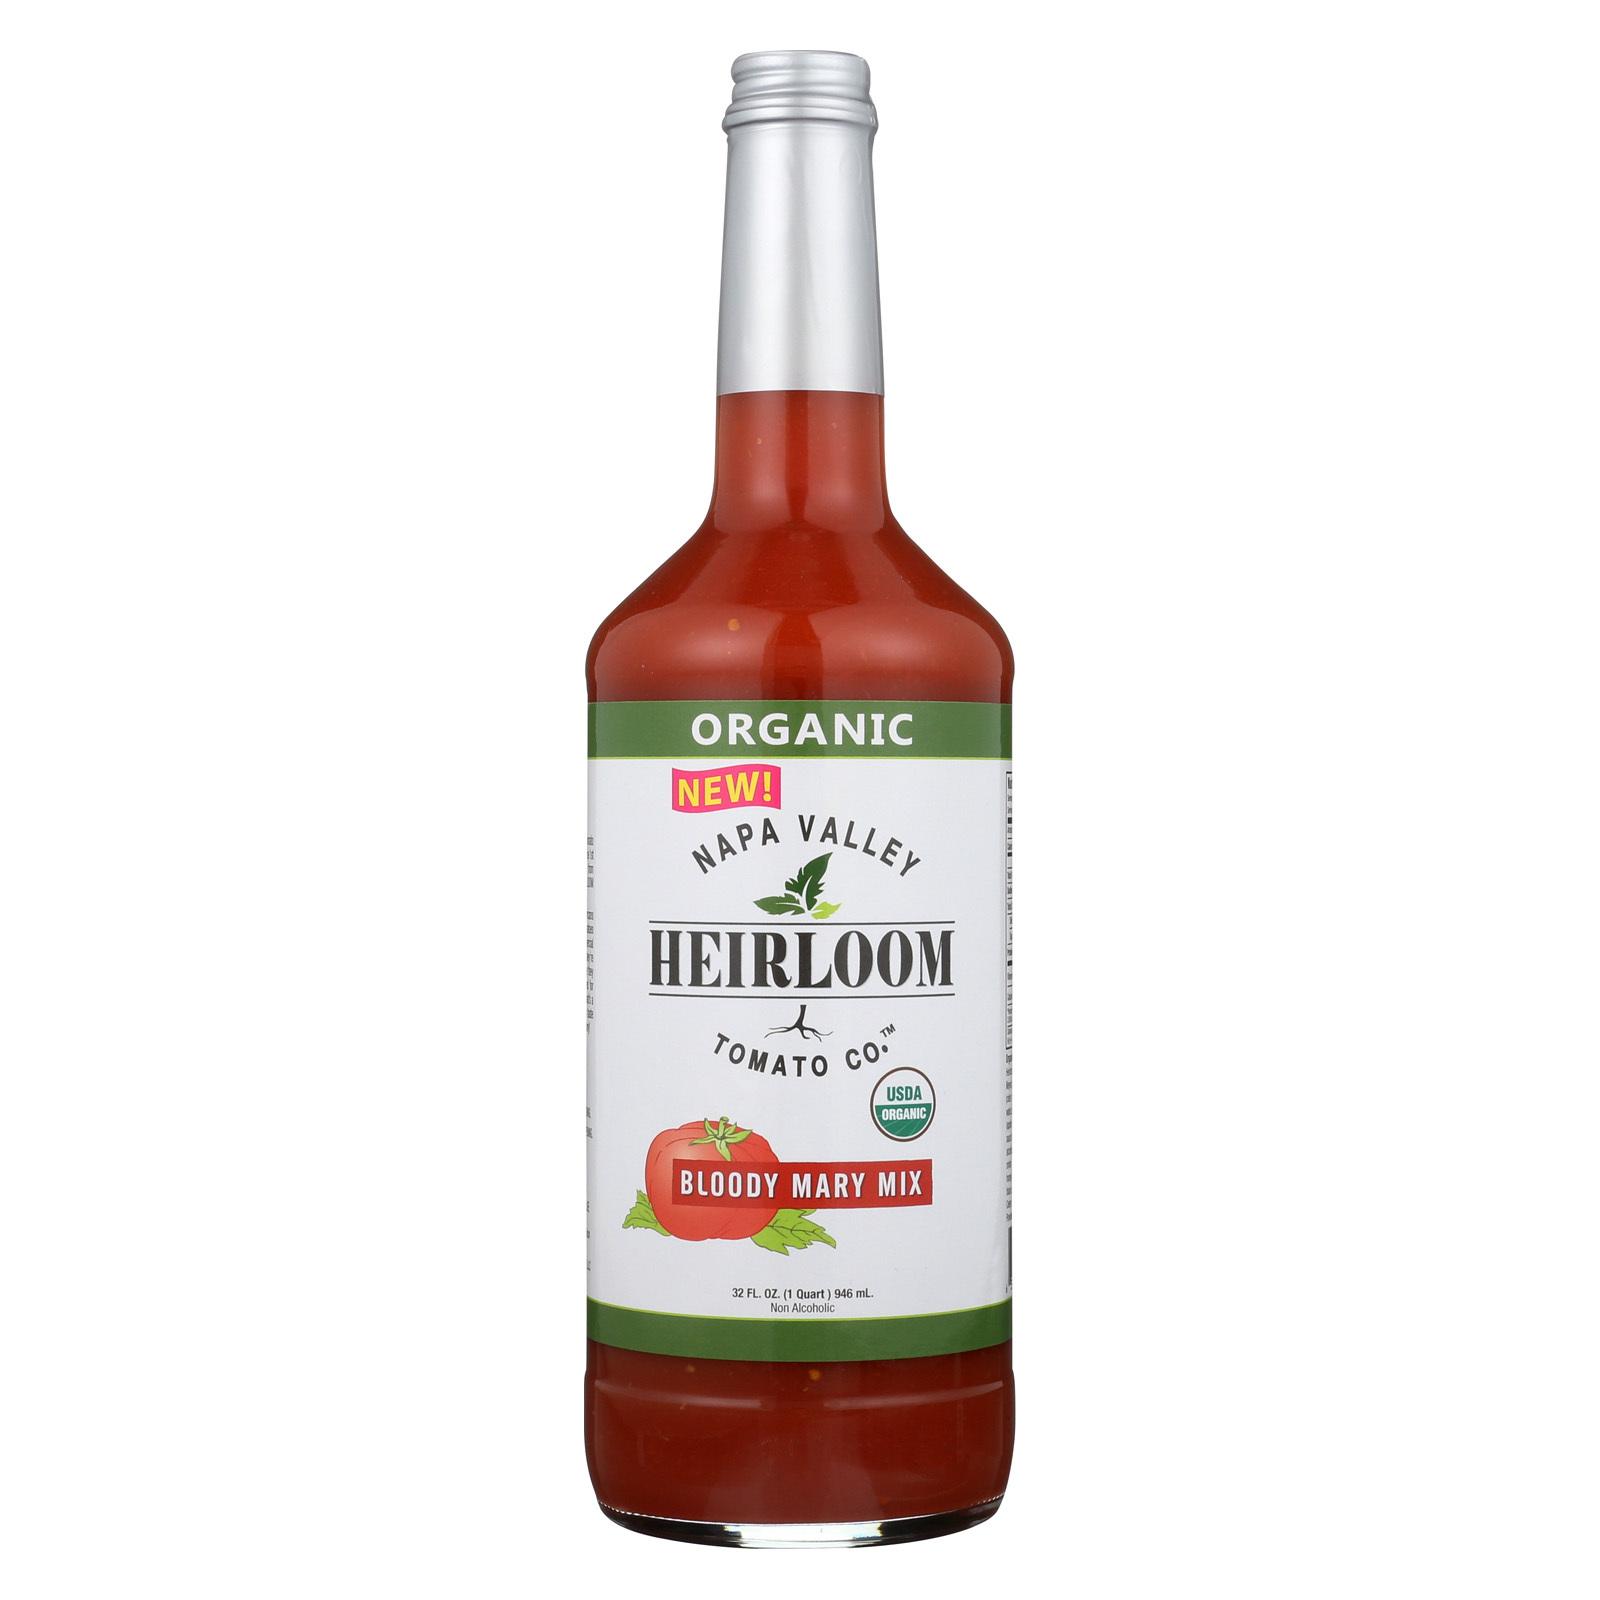 Napa Valley Heirloom Tomato Beverage Mix - Bloody Mary - Case of 12 - 32 Fl oz.